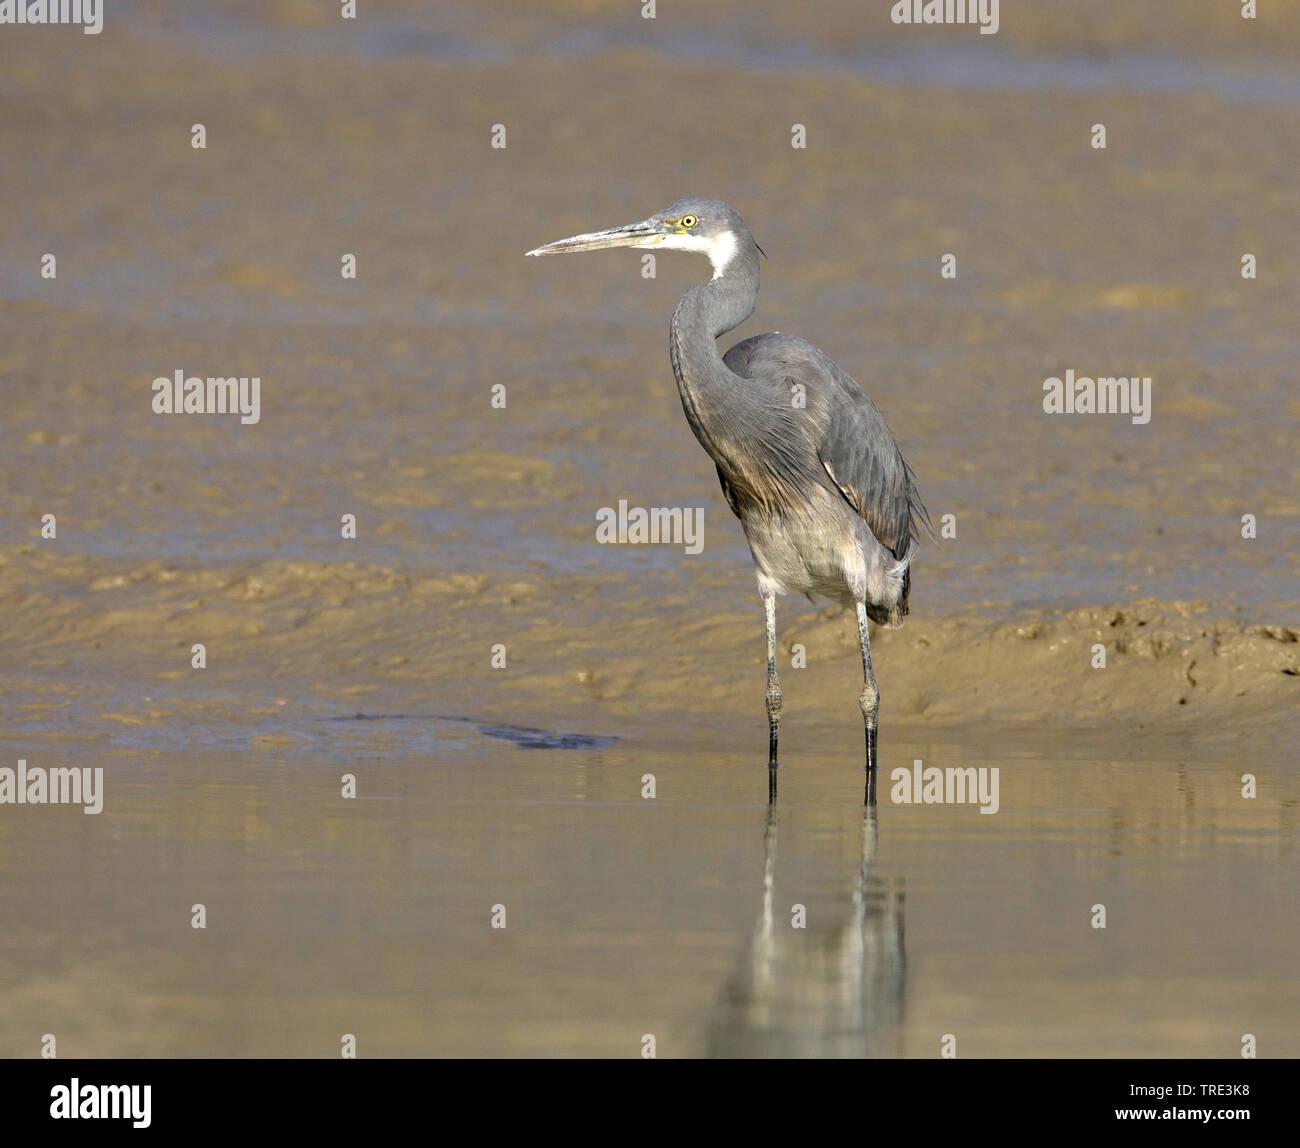 Kuestenreiher, Kuesten-Reiher (Egretta gularis), am Wasser, dunkle Morphe, Iran | western reef egret (Egretta gularis), by the waterside, dark morph, - Stock Image